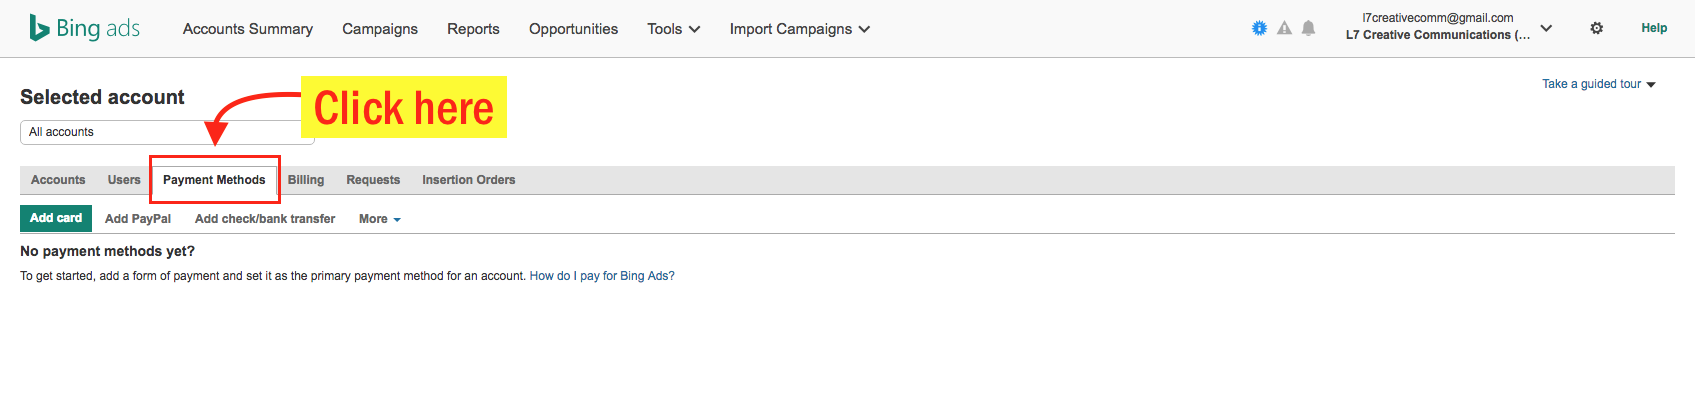 Edit Your Bing Ads Payment Info - Step 4 Screenshot